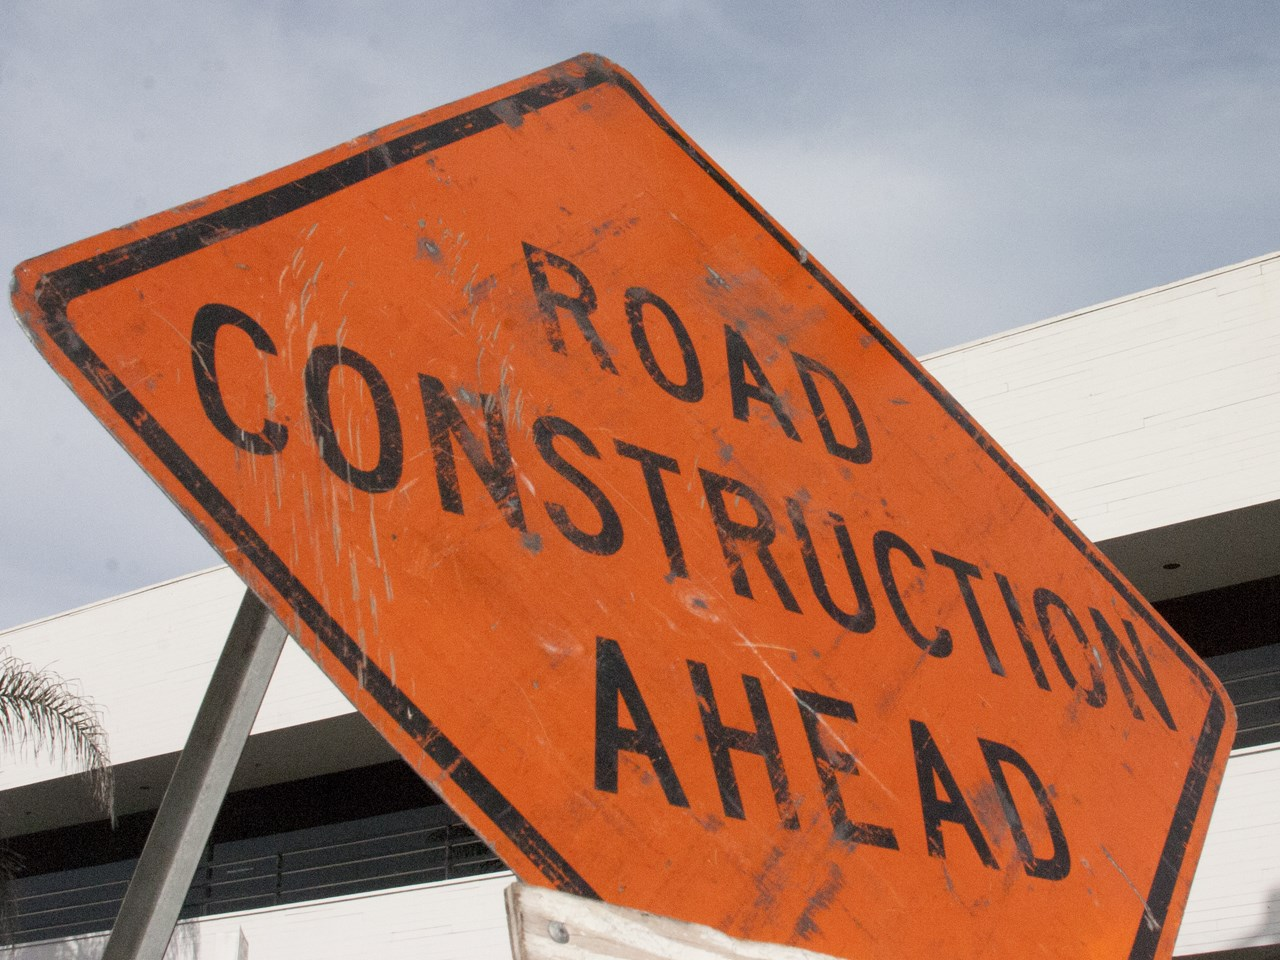 road construction at u of a